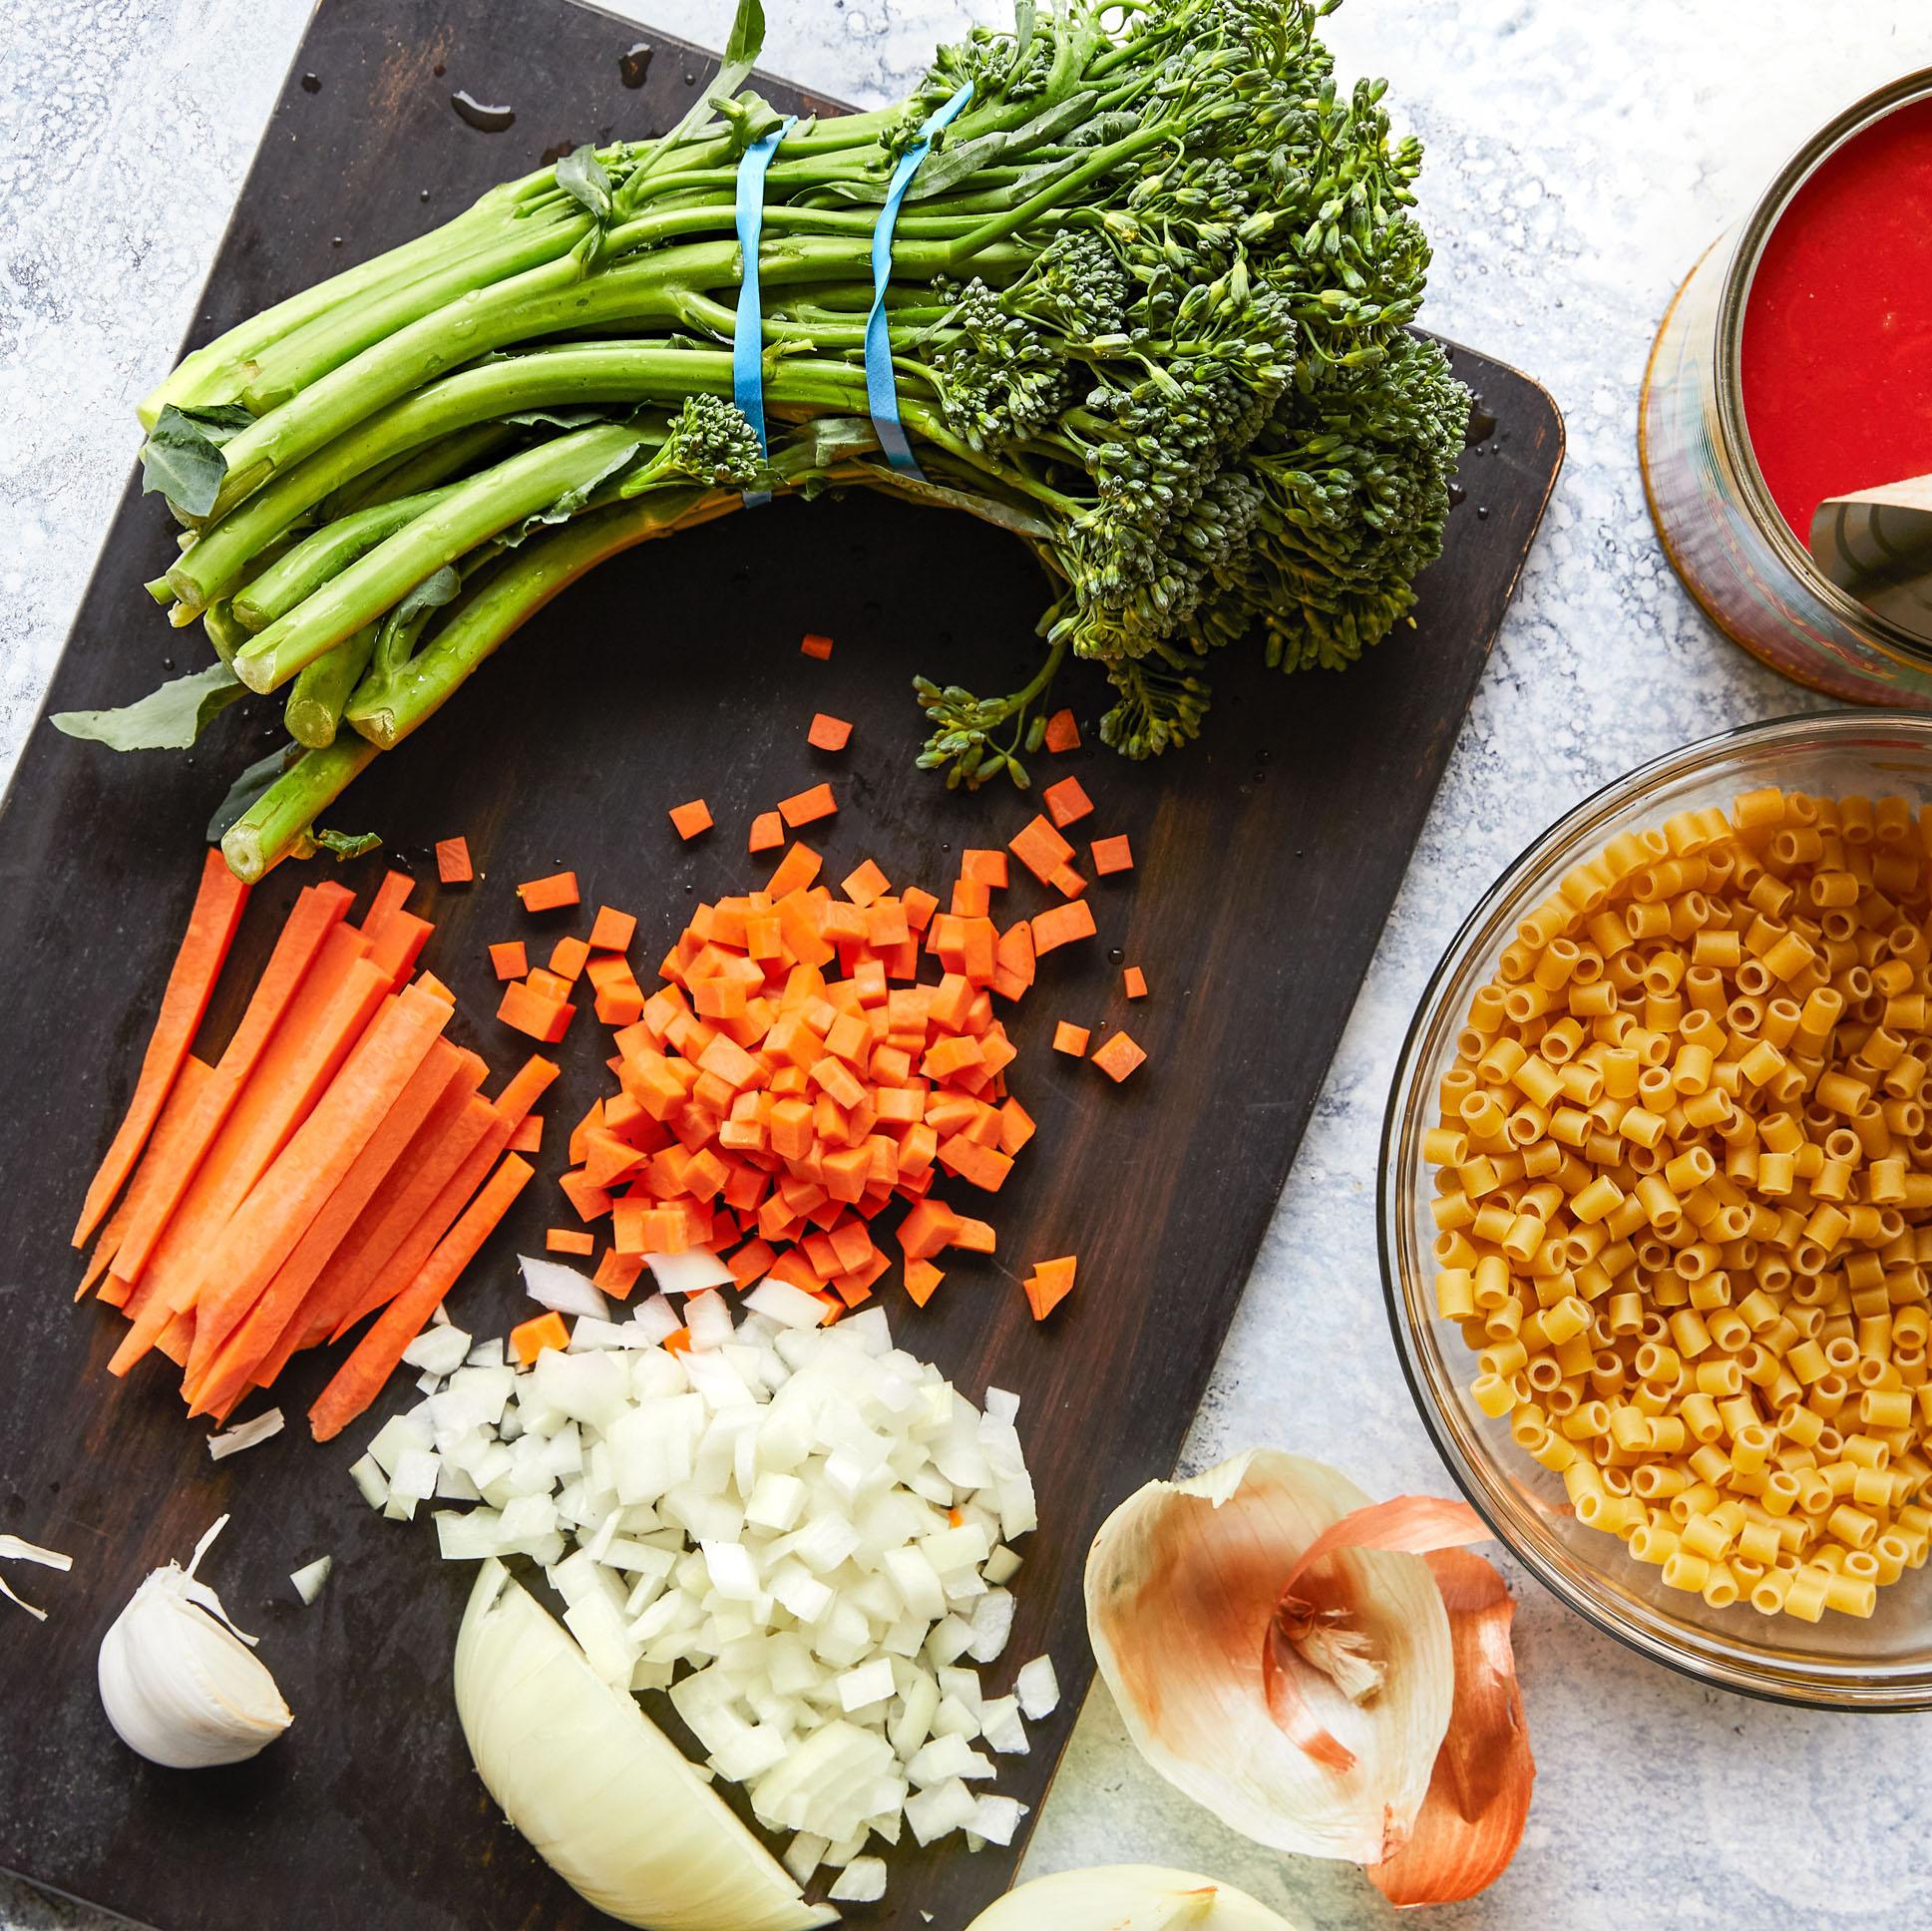 prepped vegetables and pasta for dinner